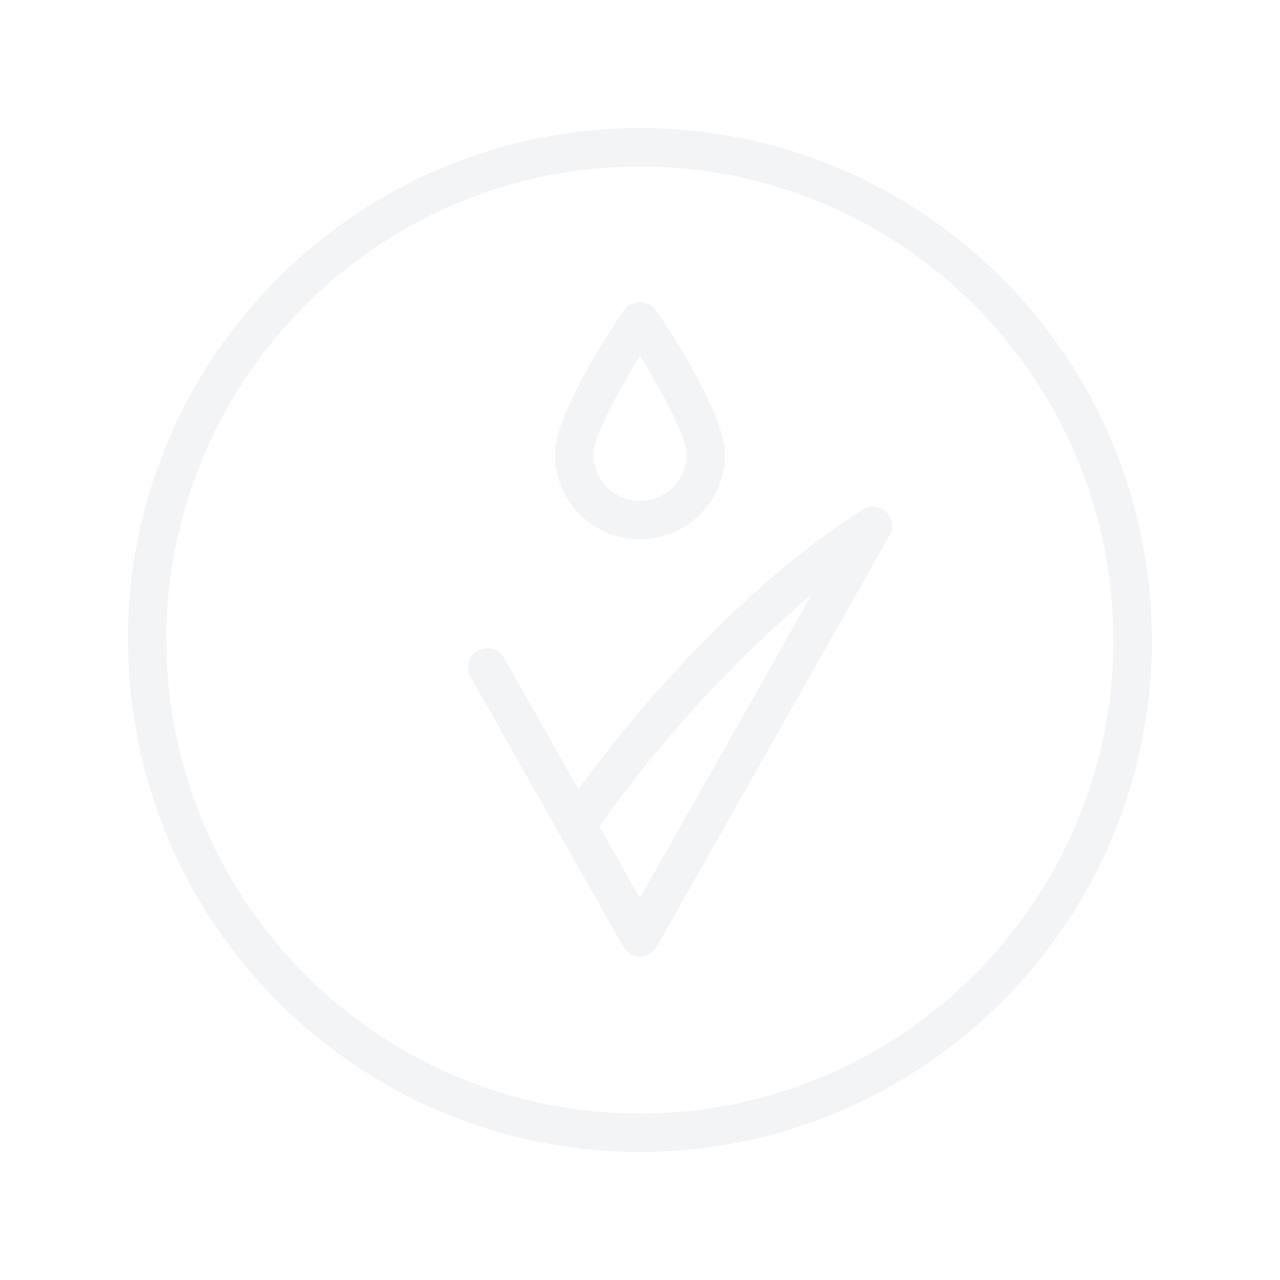 Everyday Minerals Shimmer Blush Wonderful 4.8g